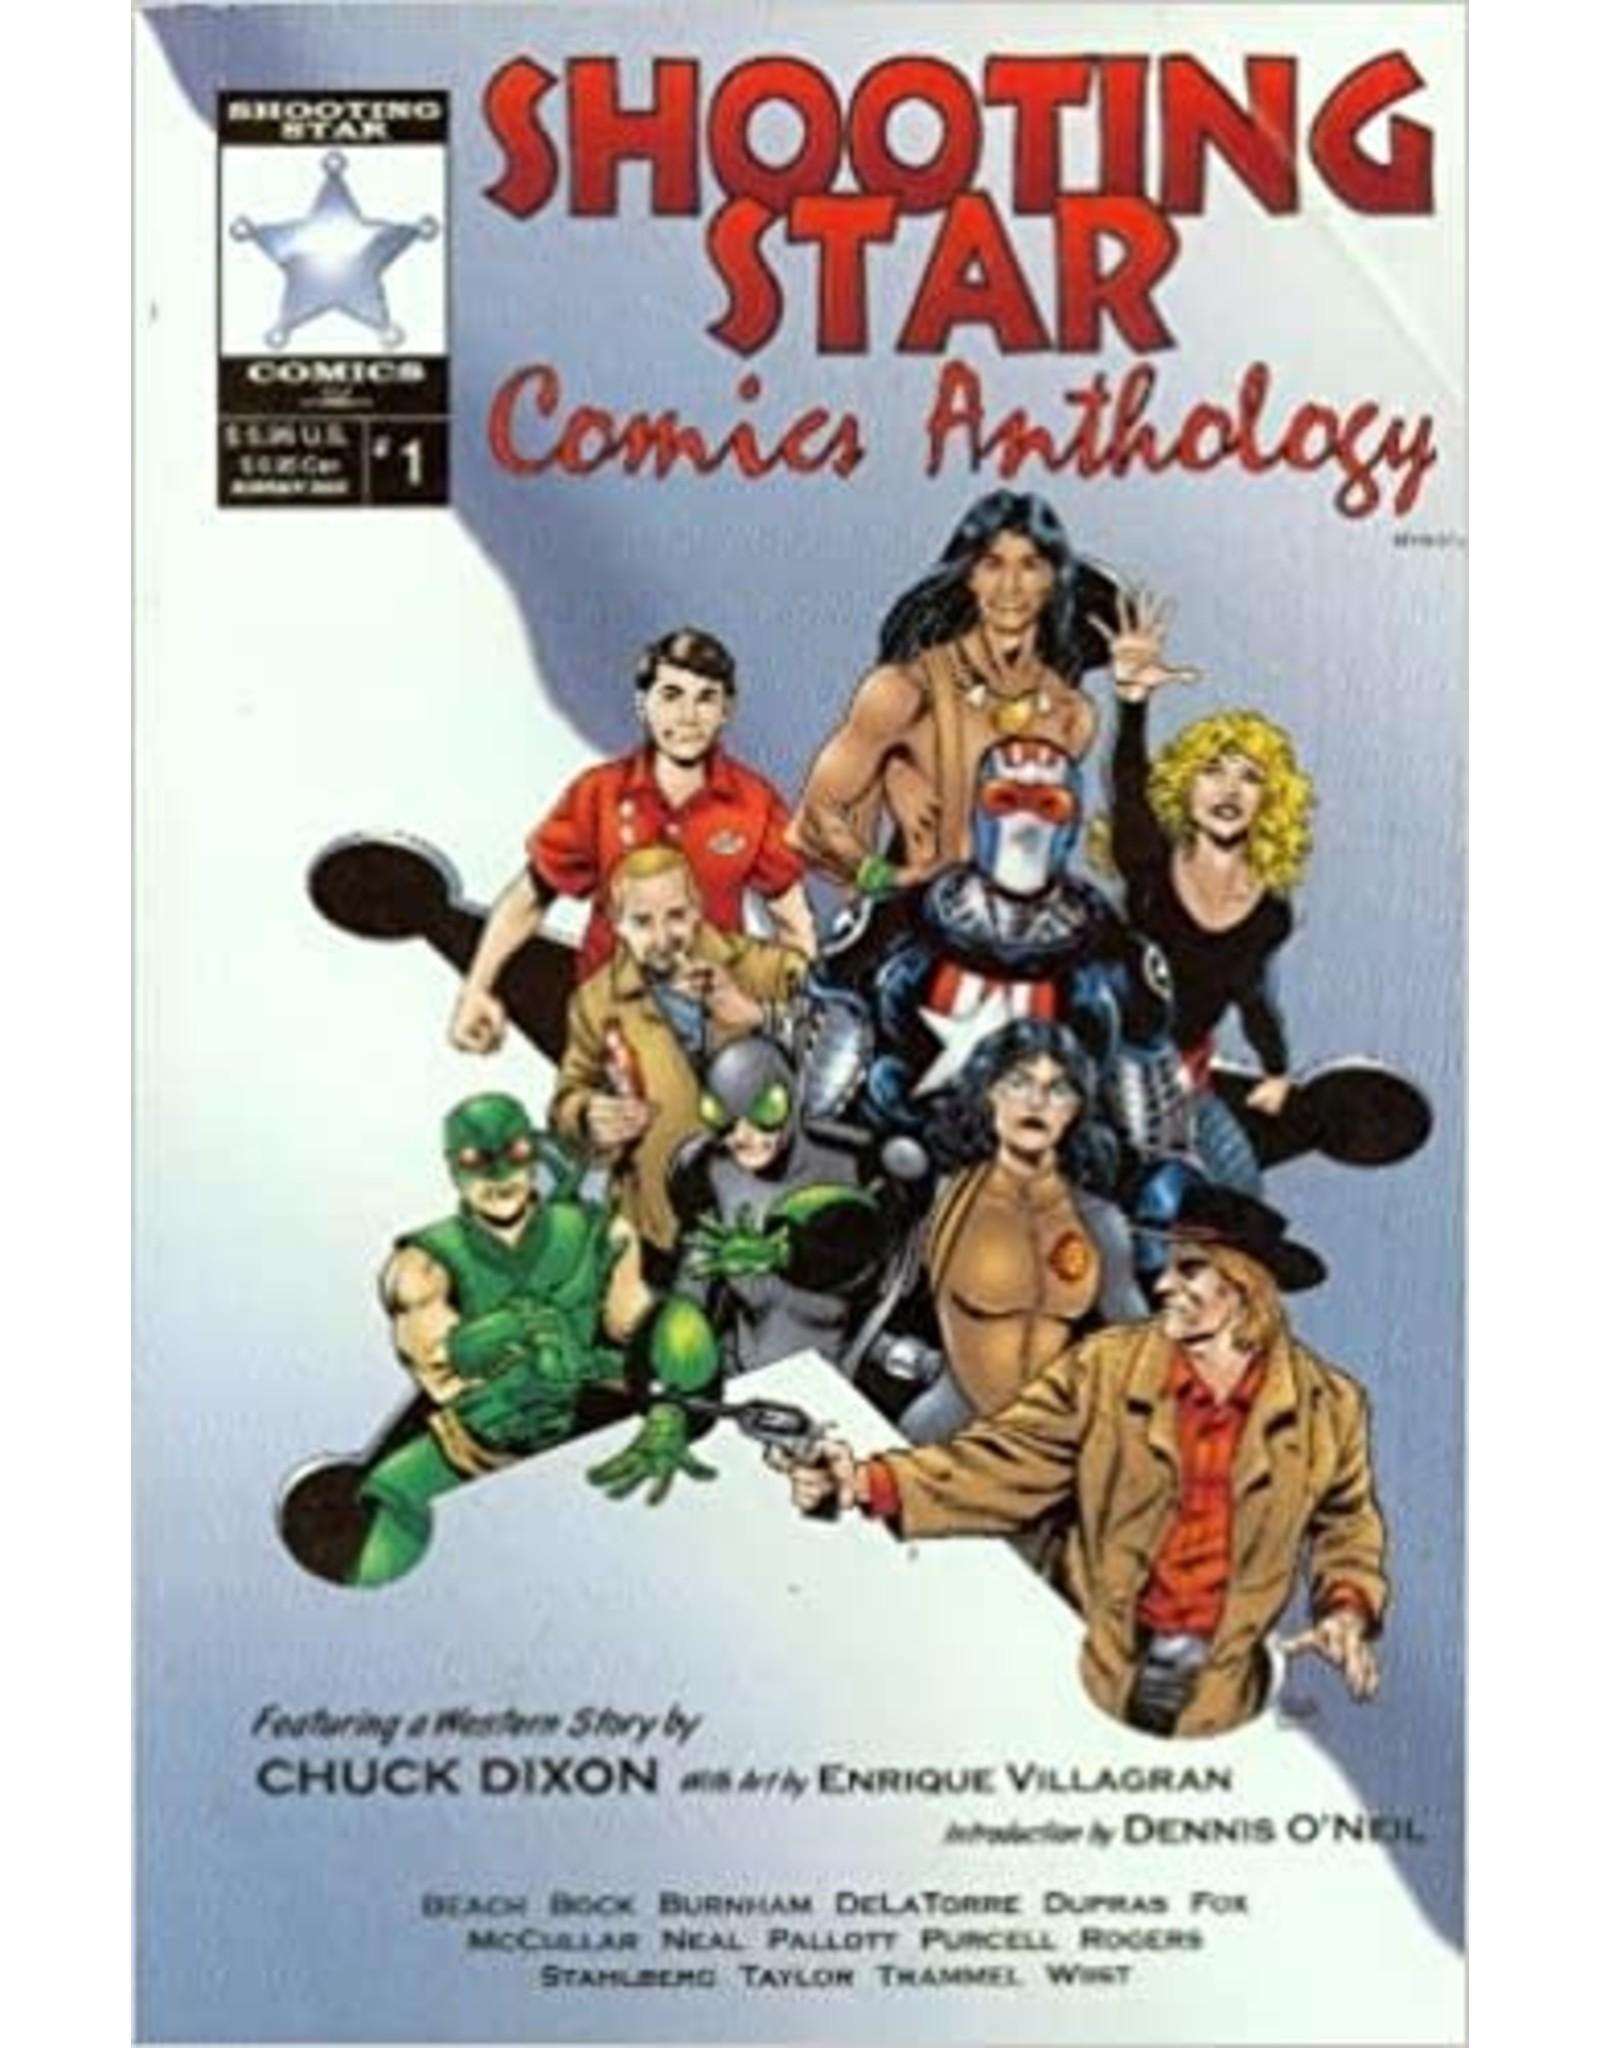 SHOOTING STAR COMICS SHOOTING STAR COMICS ANTHOLOGY #1